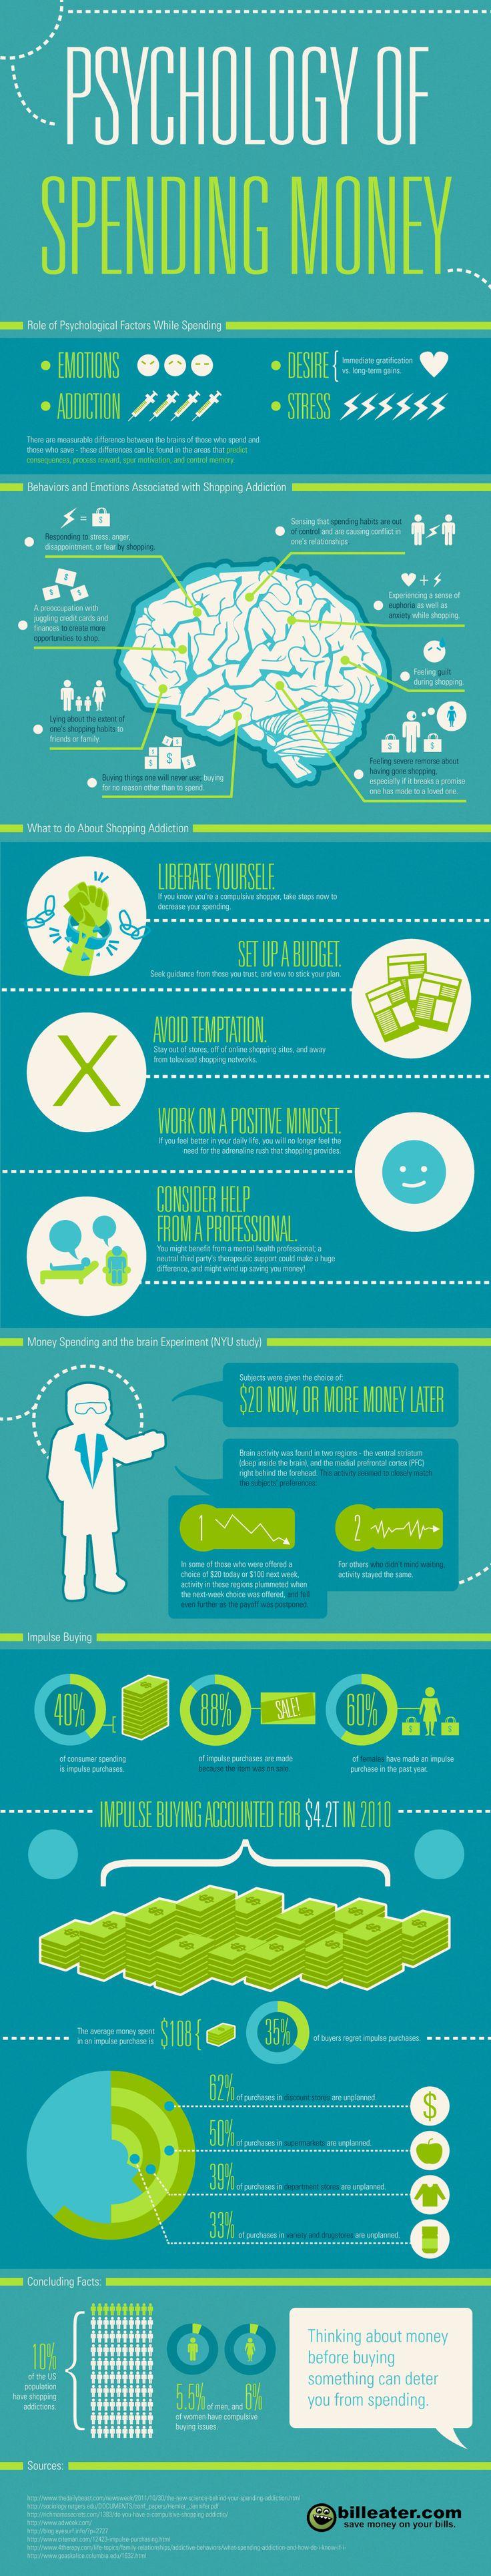 The Psychology of Spending Money: Infographic | savingtools.com